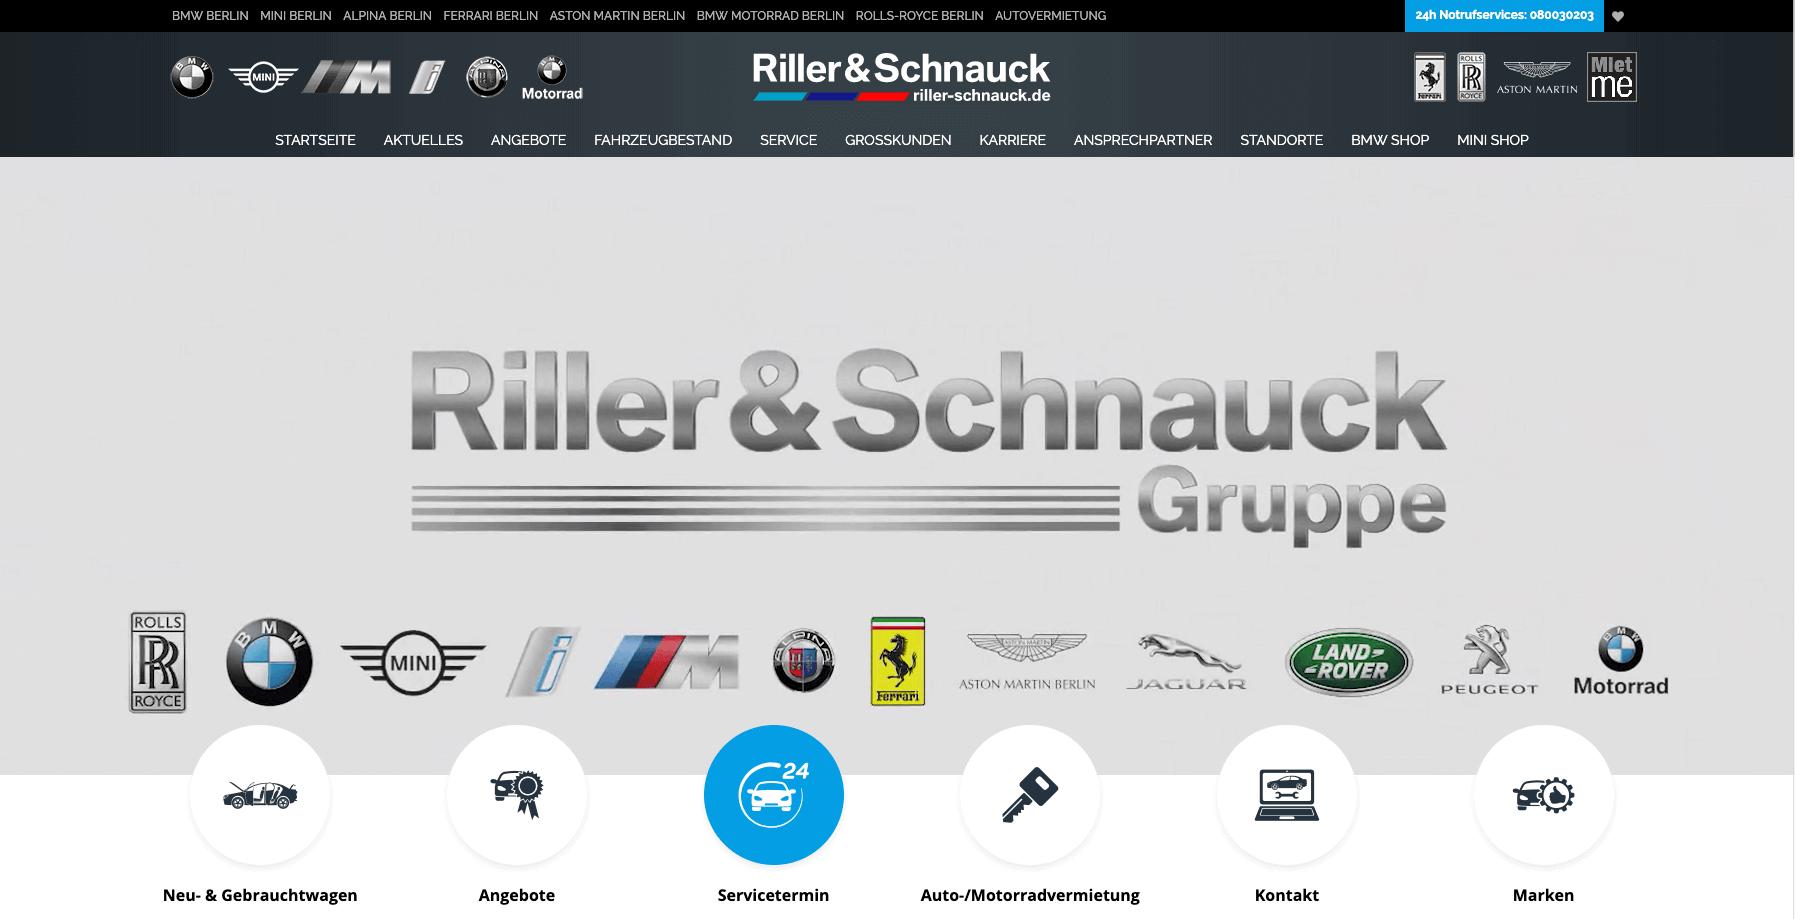 riller-schnauck-shop